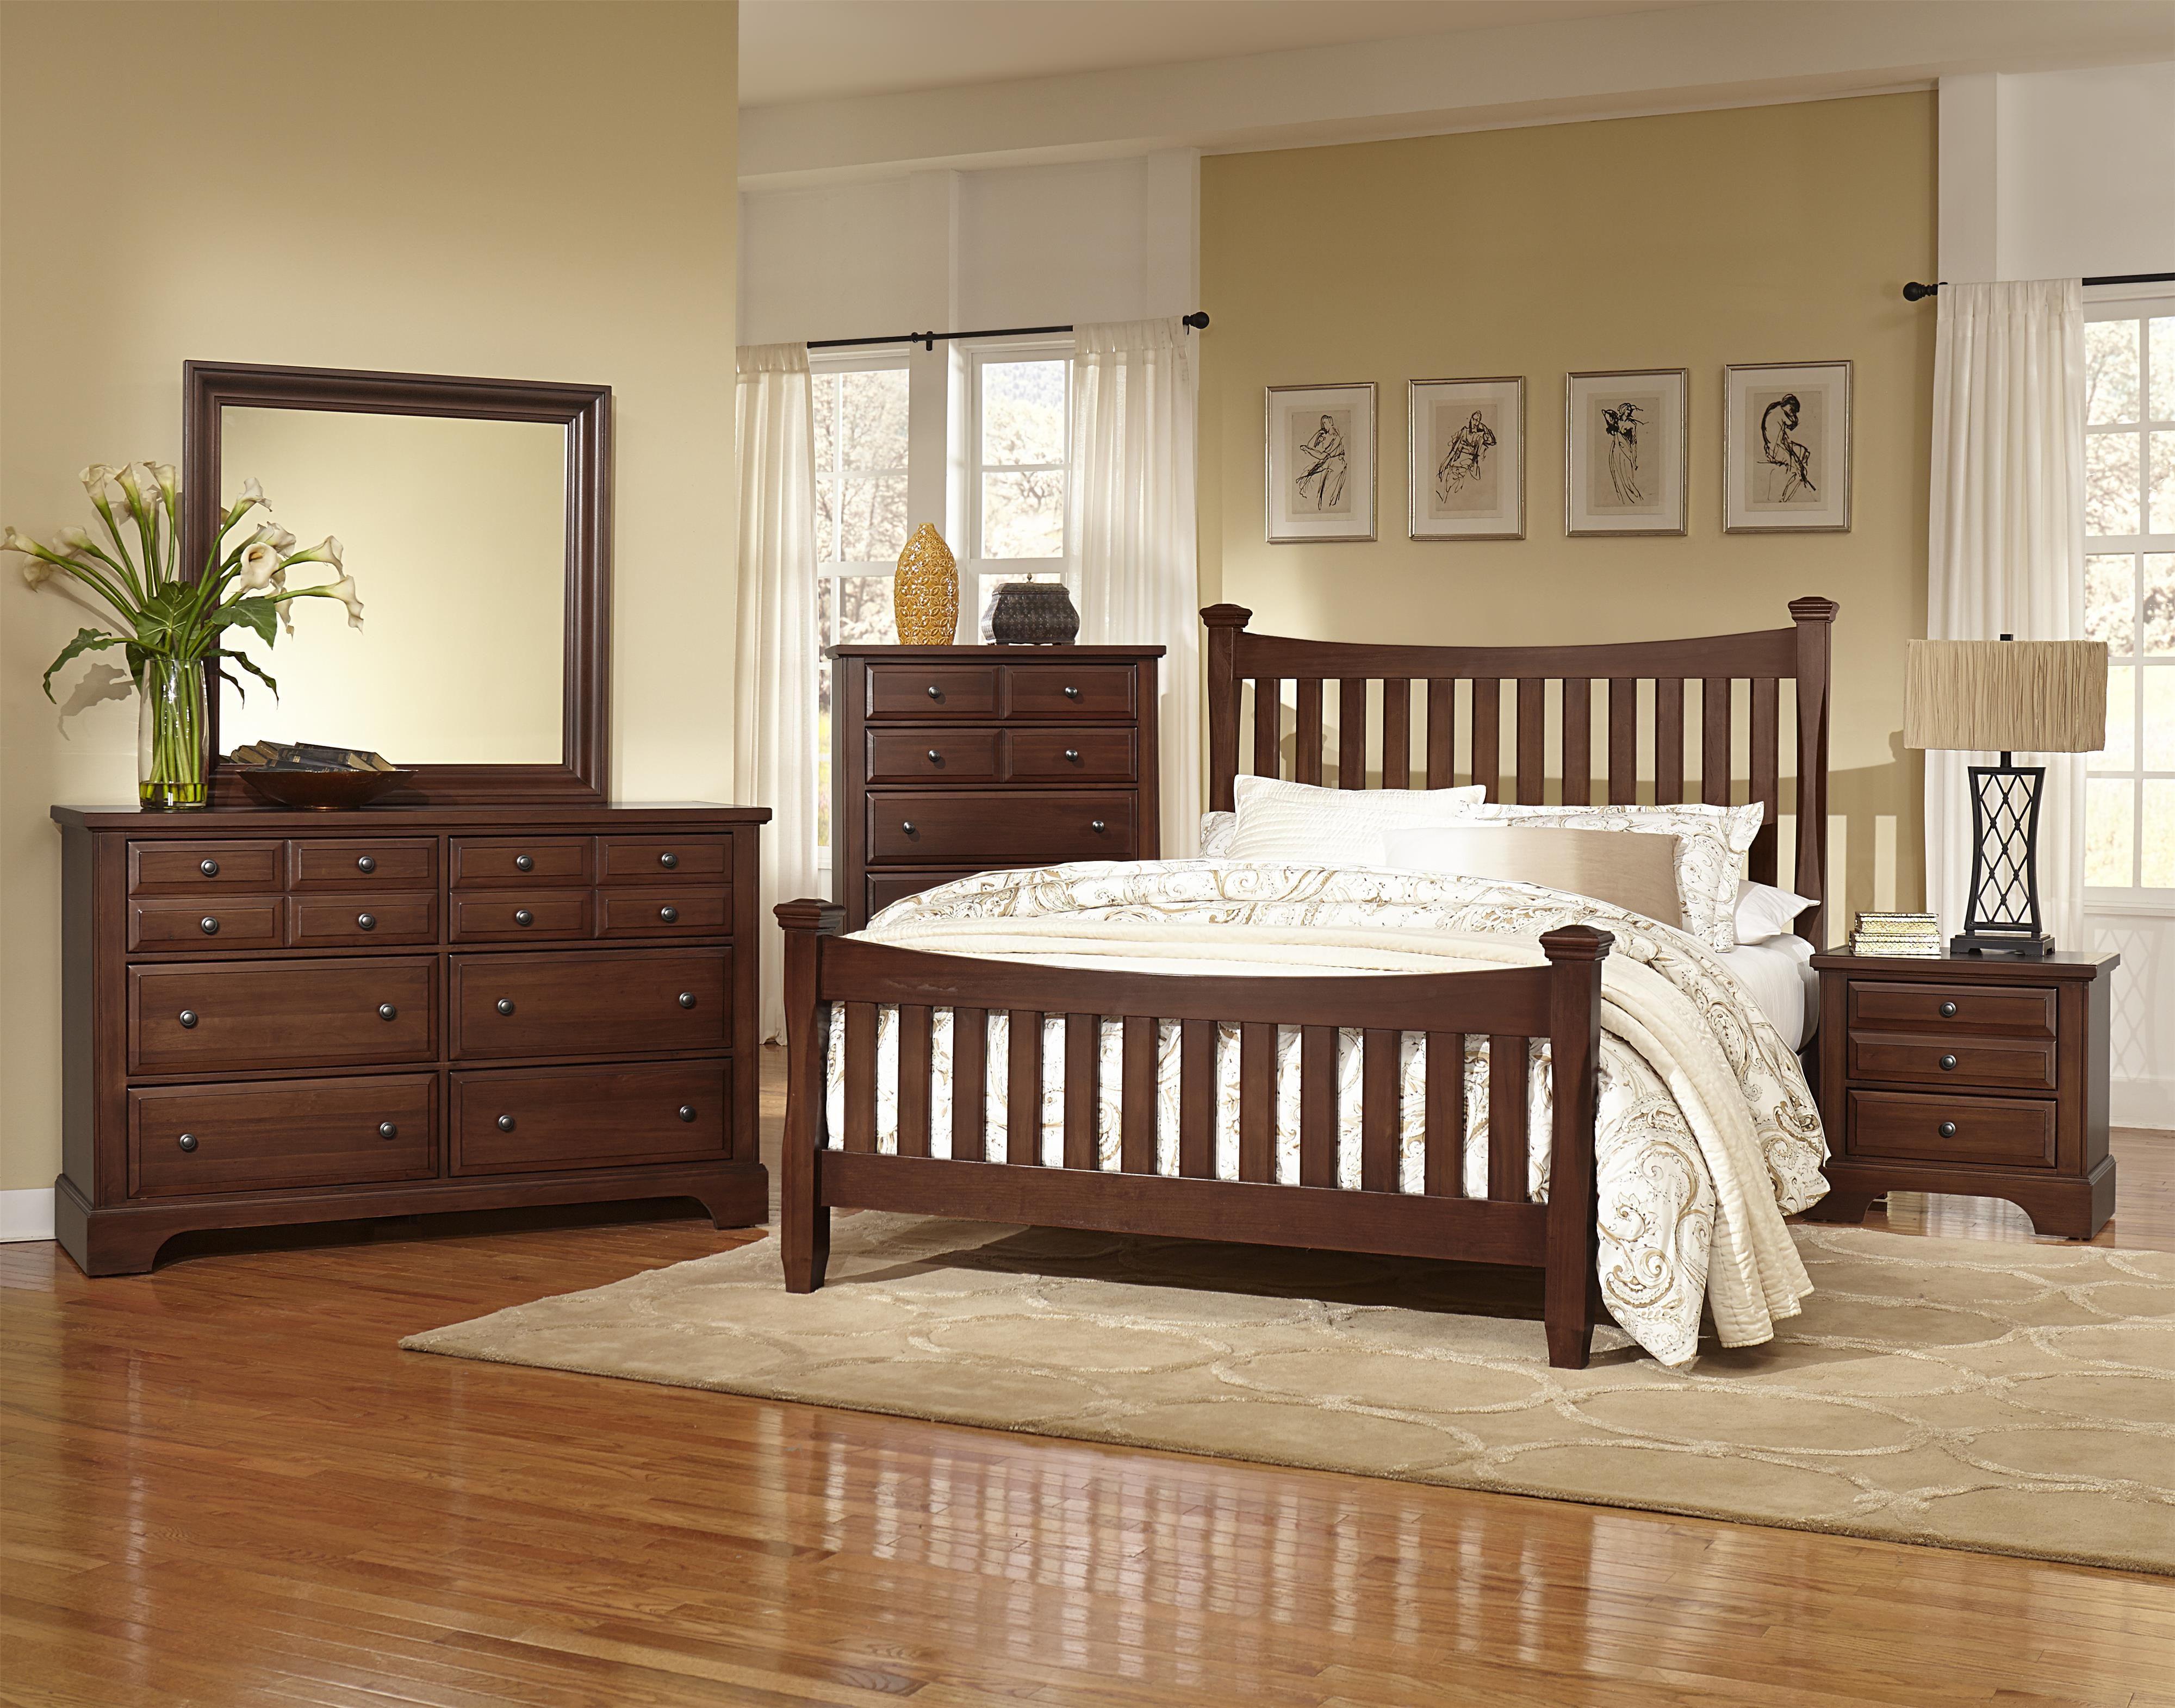 Bedford King Bedroom Group By Vaughan Bassett At Mueller Furniture Bedroom Sets Queen Furniture King Bedroom